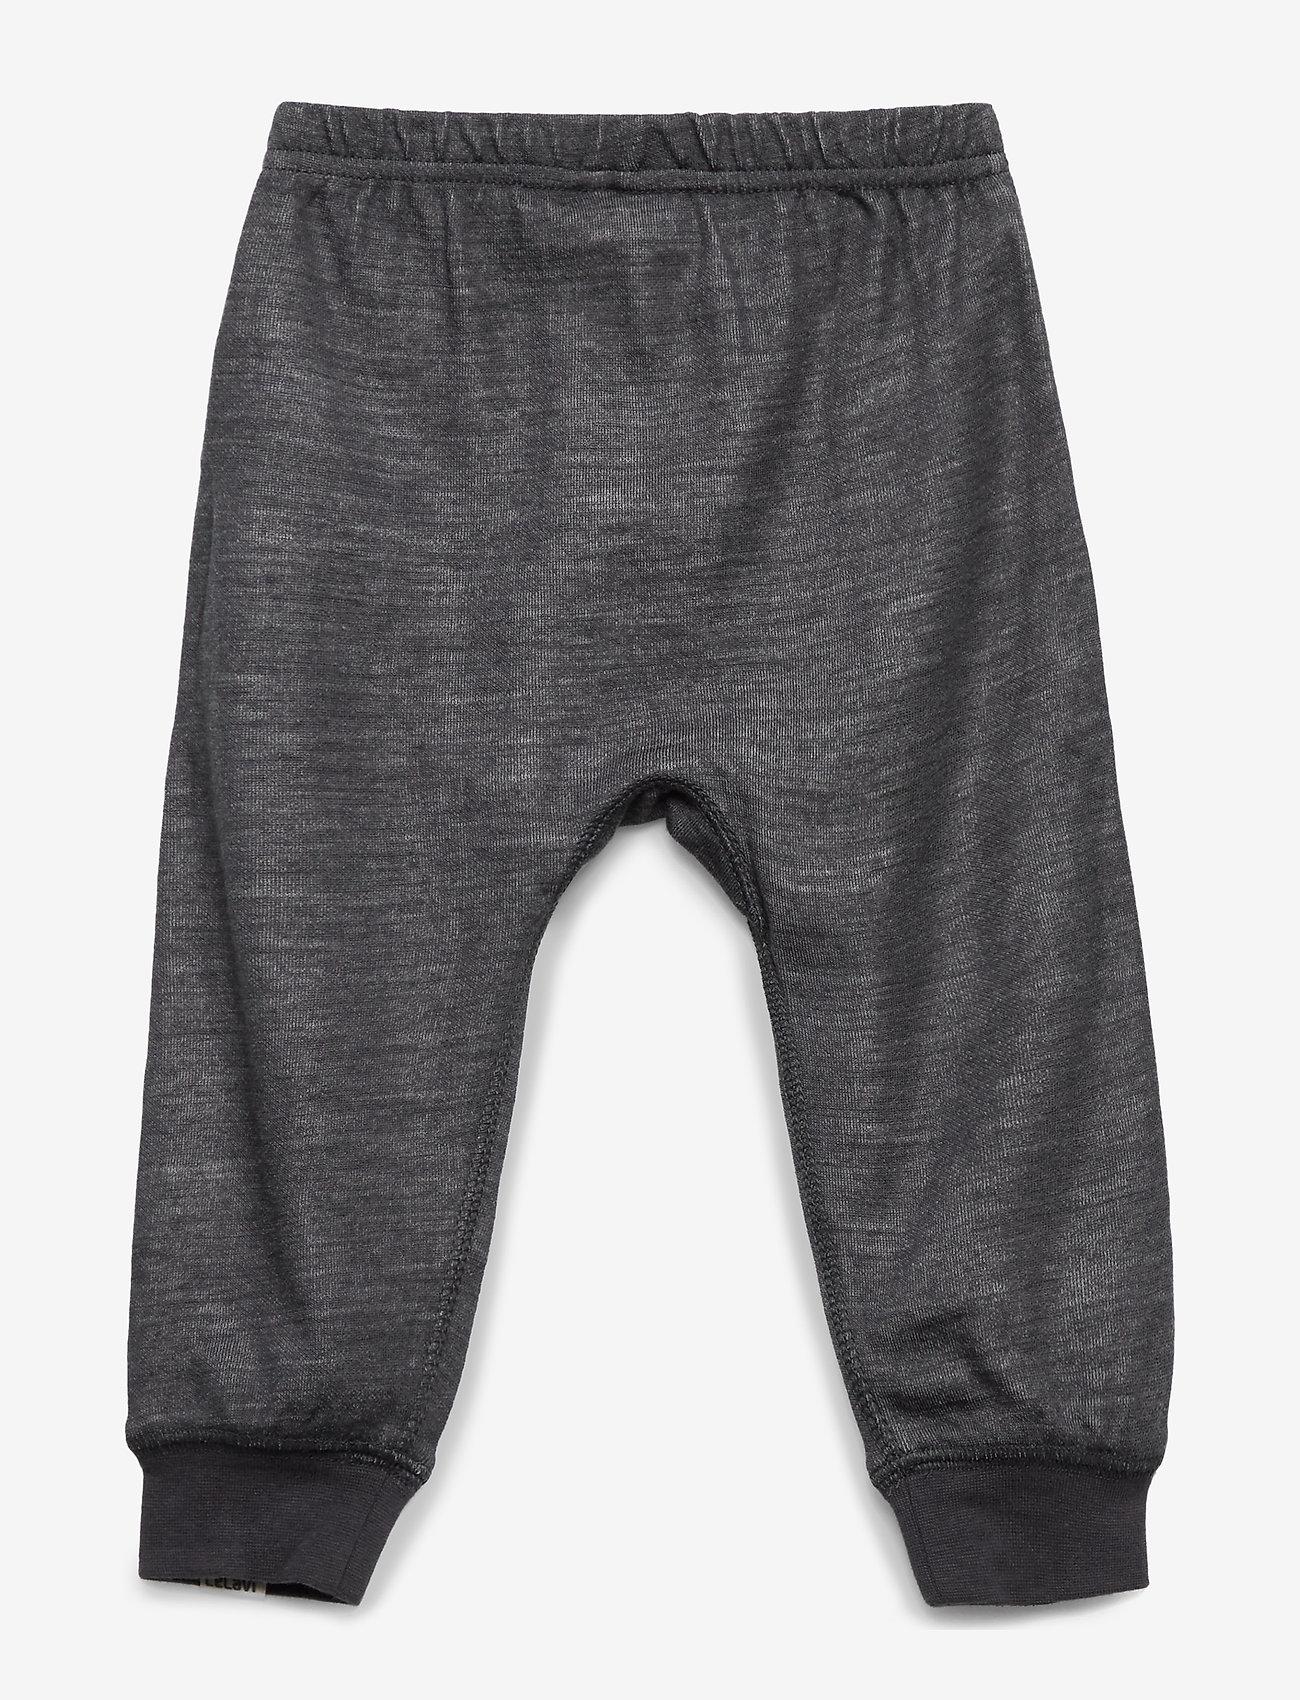 Harem Pants (Asphalt) (16.77 €) - CeLaVi Ff78a